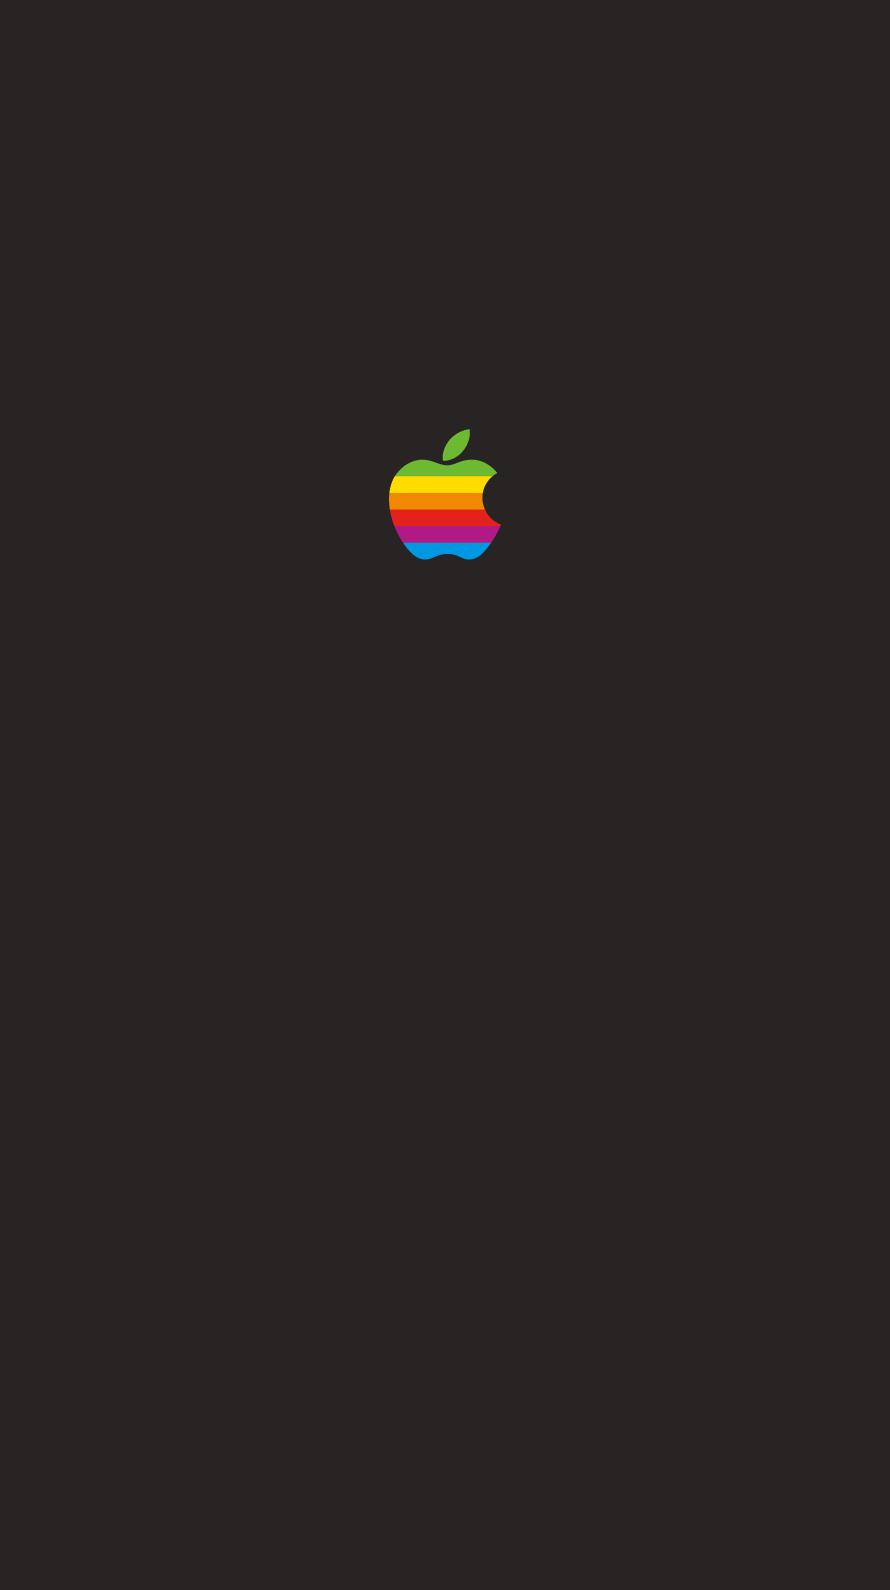 iPhone7, 6, 5用壁紙 Appleレインボーロゴ Black